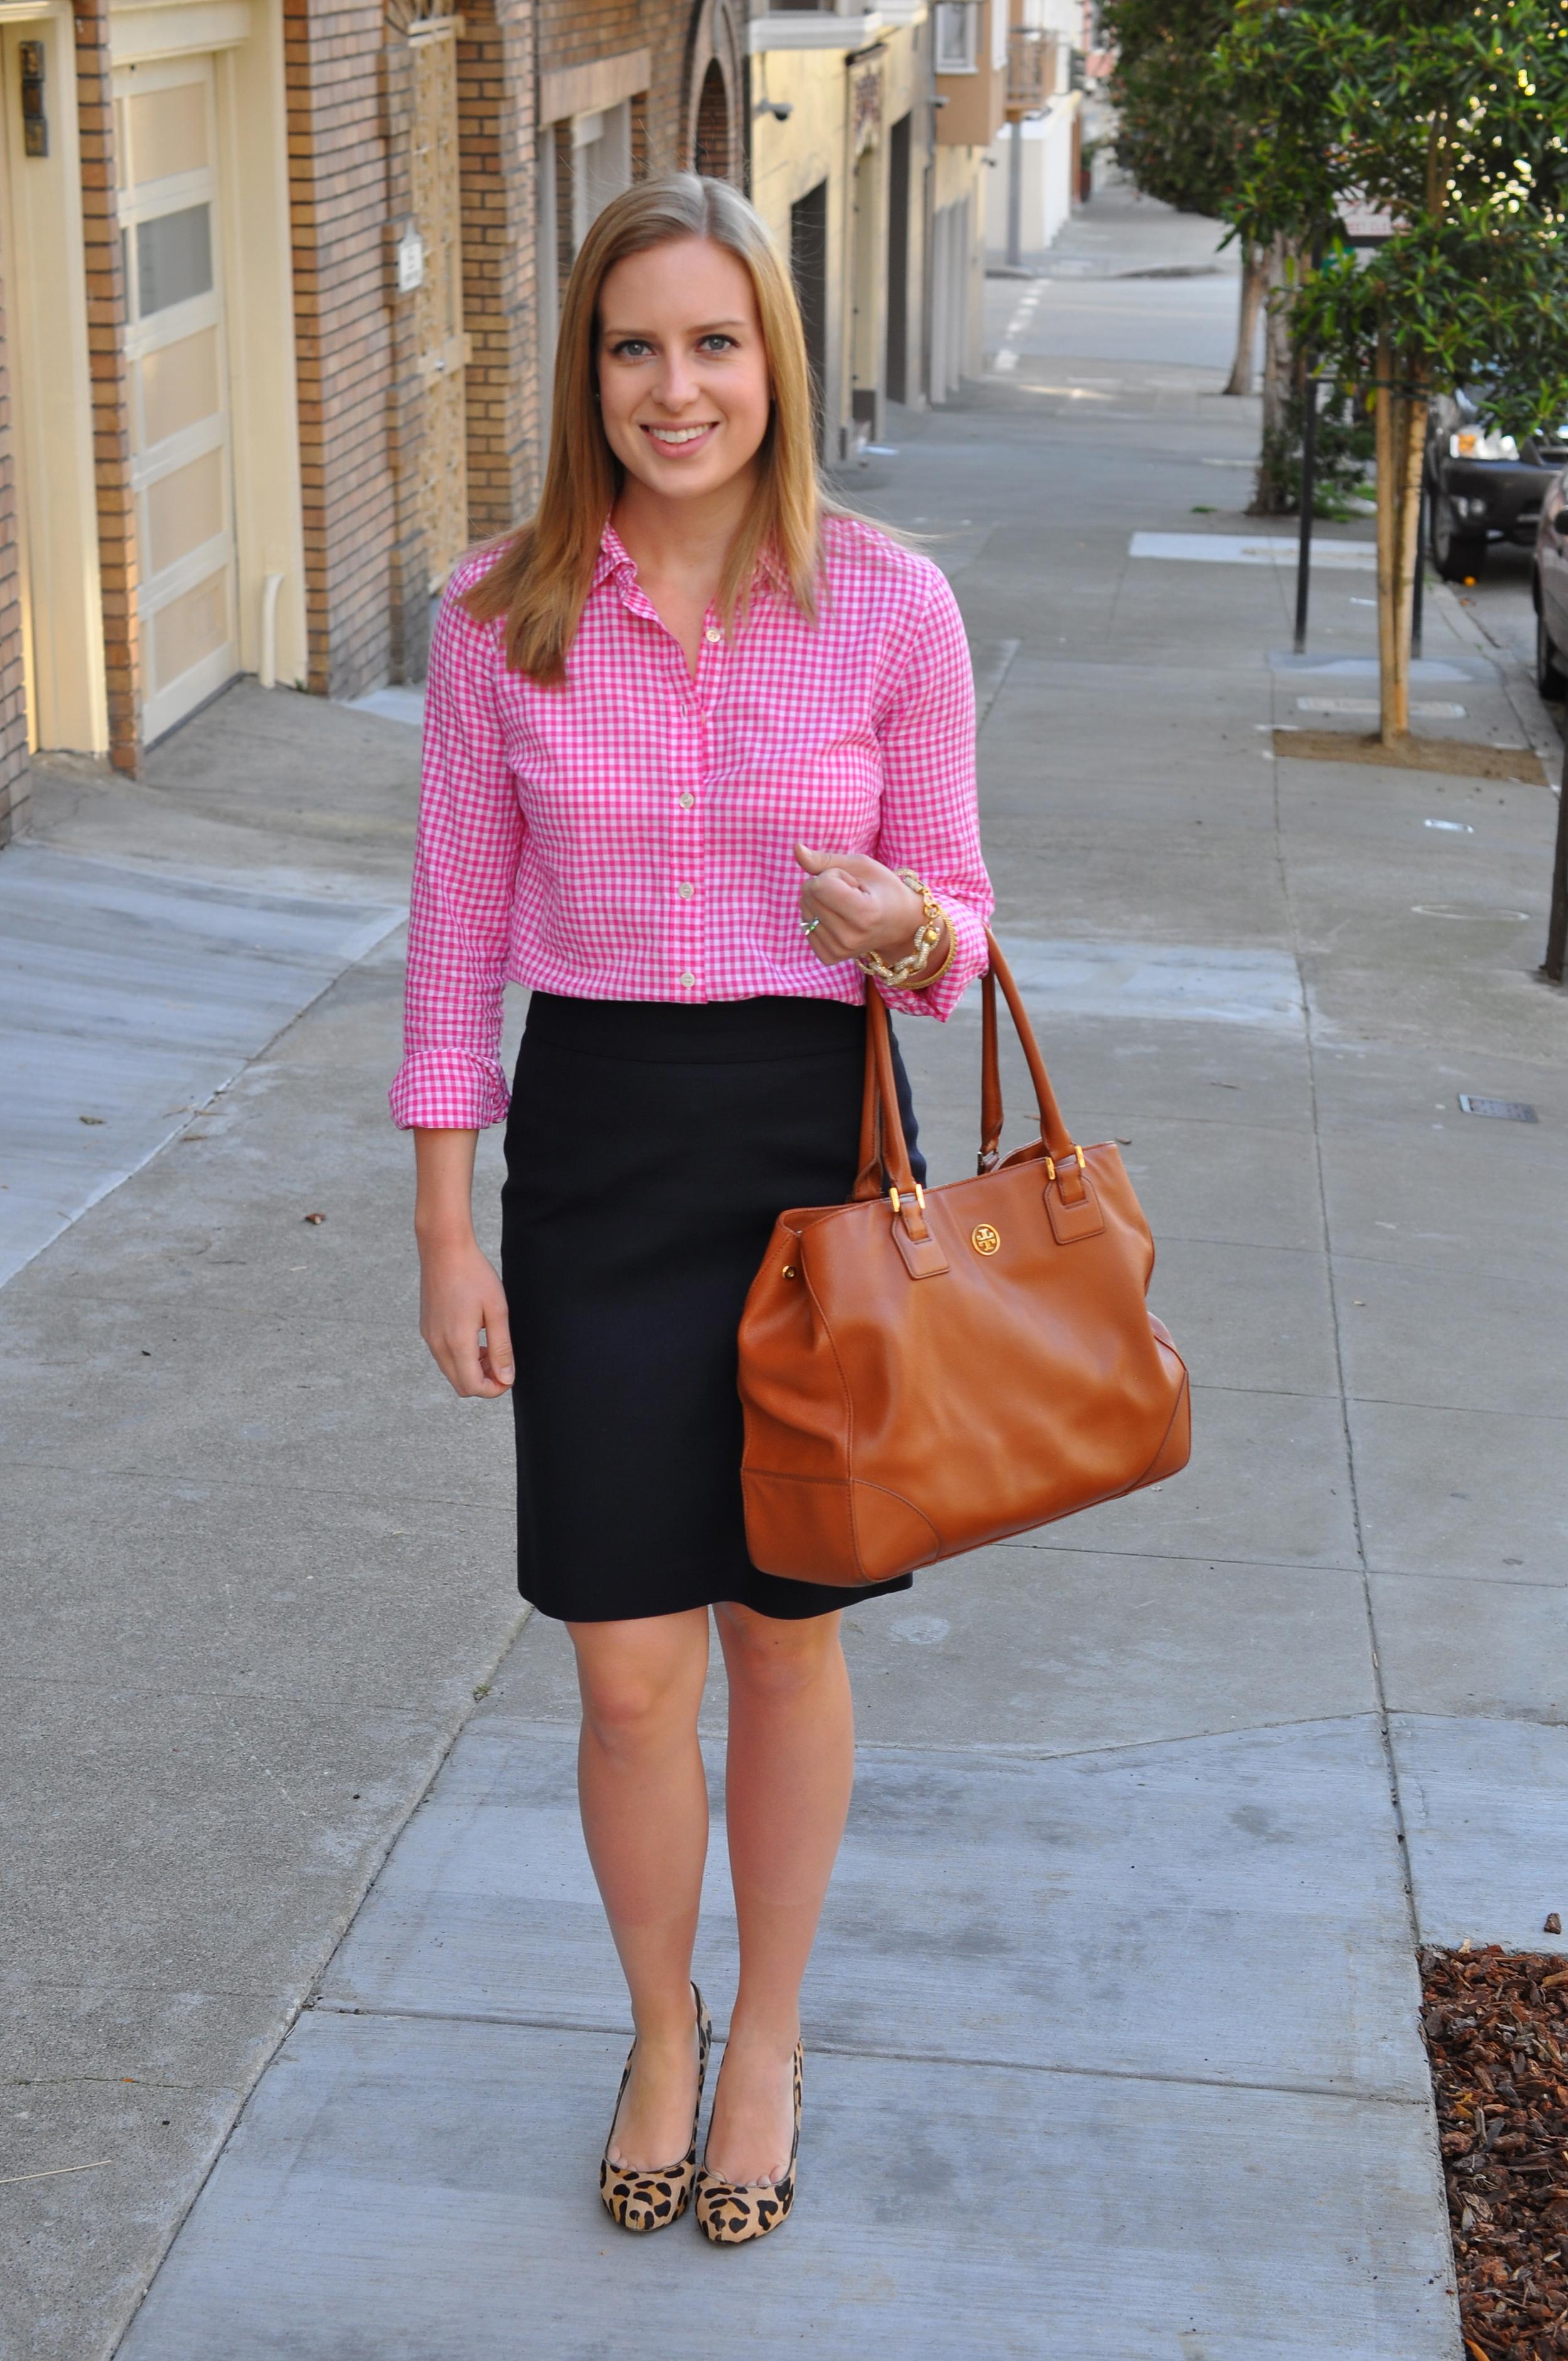 J. Crew shirt (similar), J. Crew skirt, Ivanka Trump heels (similar), J. Crew bracelet, J. Crew bangles, Tory Burch bag